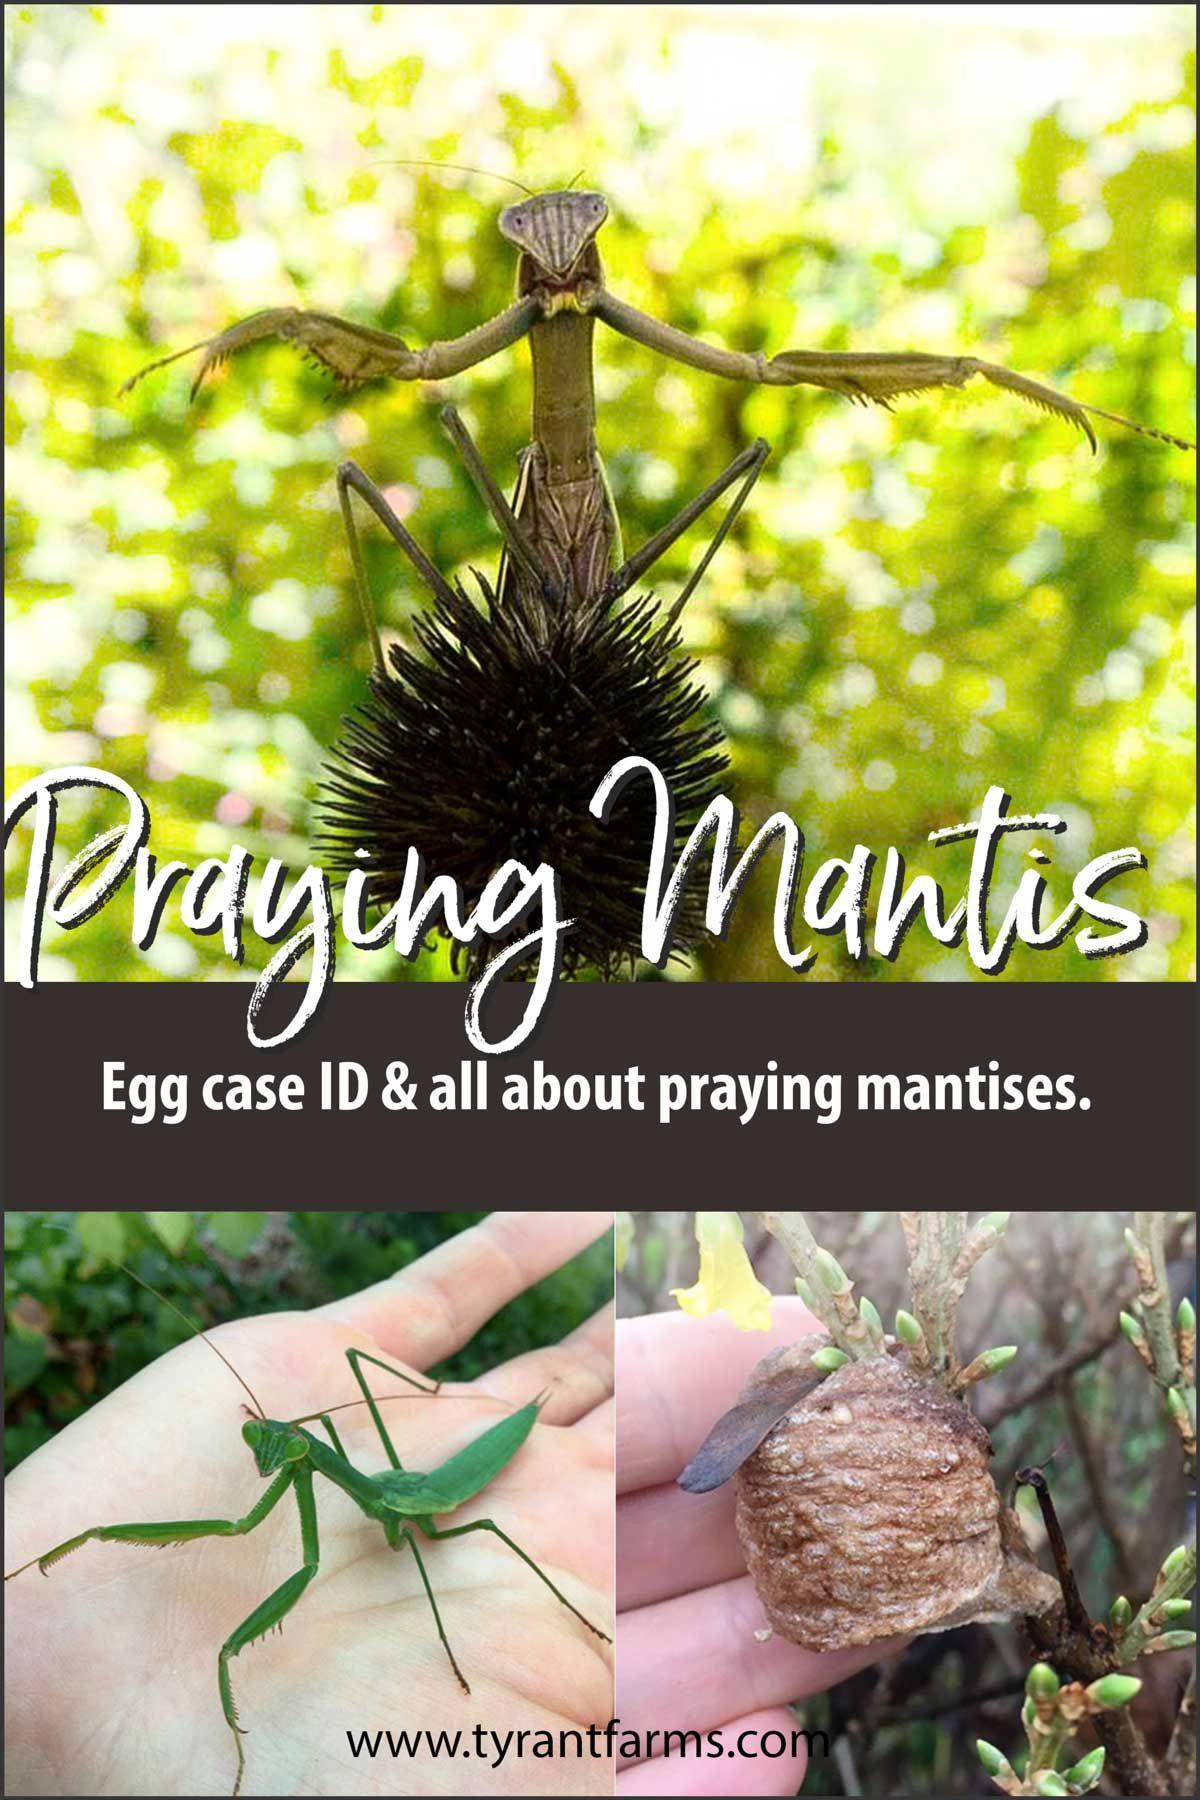 Praying Mantis Egg Case Identification And All About Praying